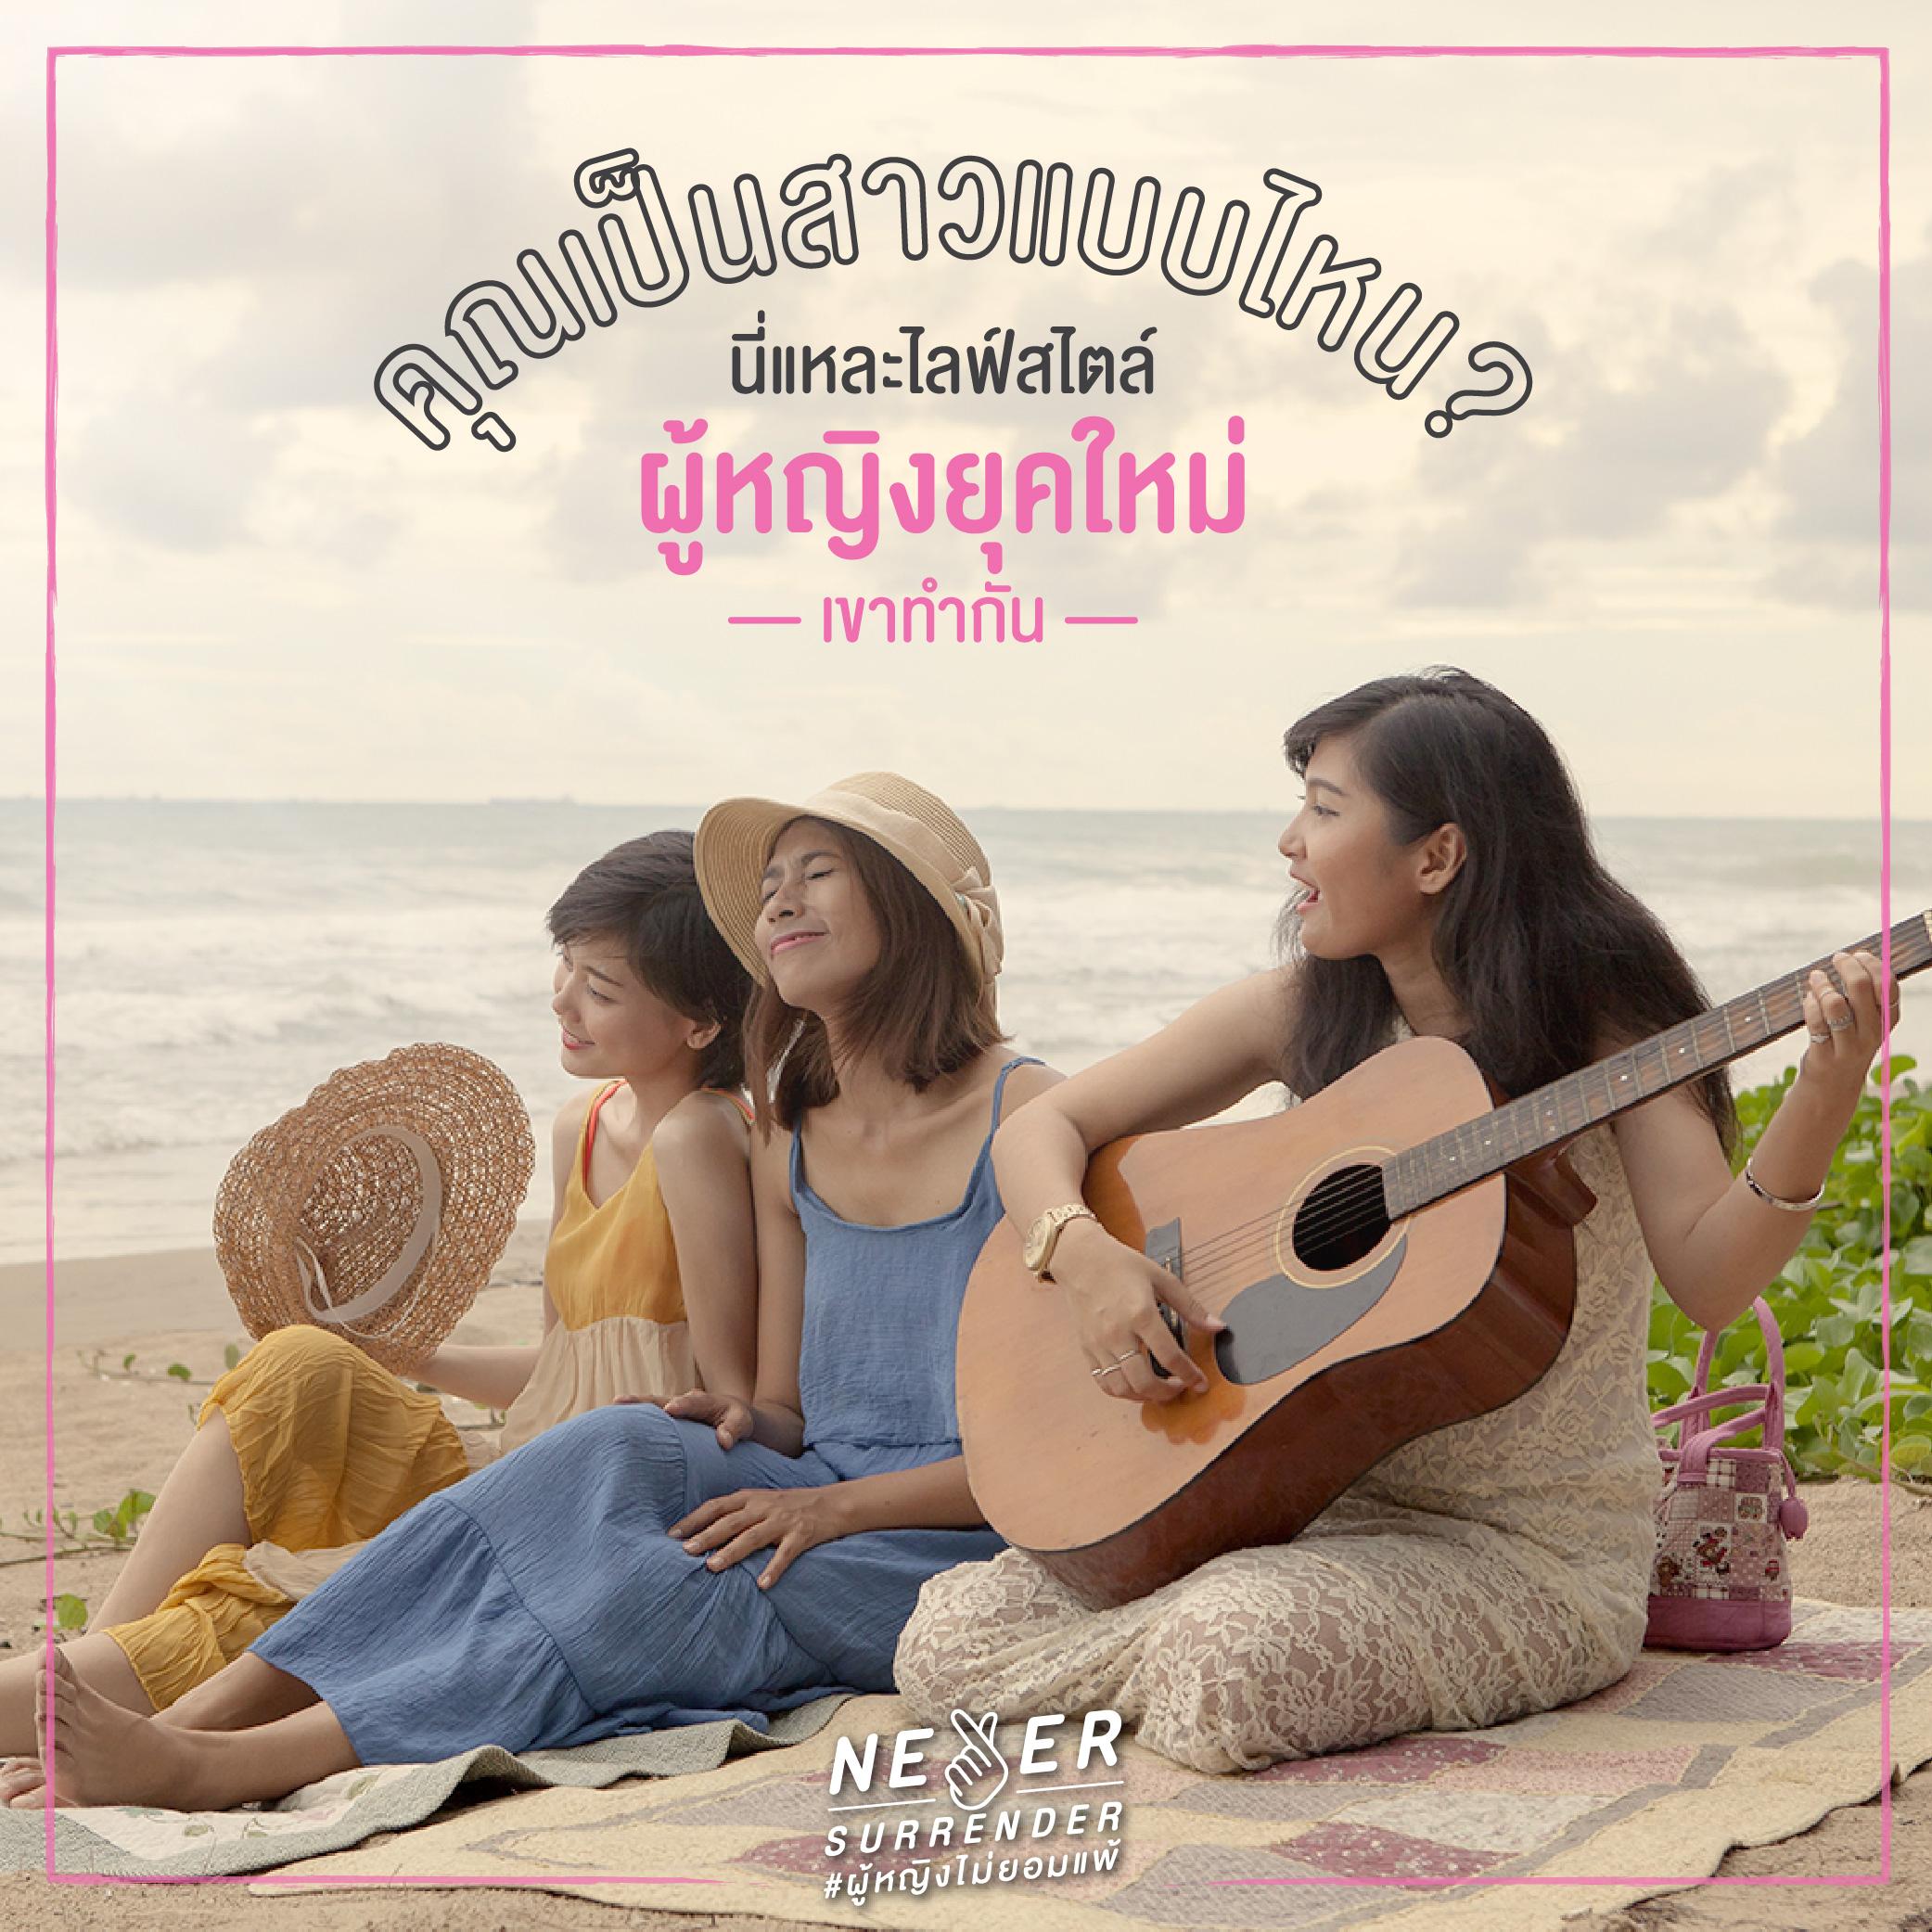 Never Surrender Thailand_คุณเป็นสาวแบบไหน? นี่แหละไลฟ์สไตล์ผู้หญิงยุคใหม่เขาทำกัน